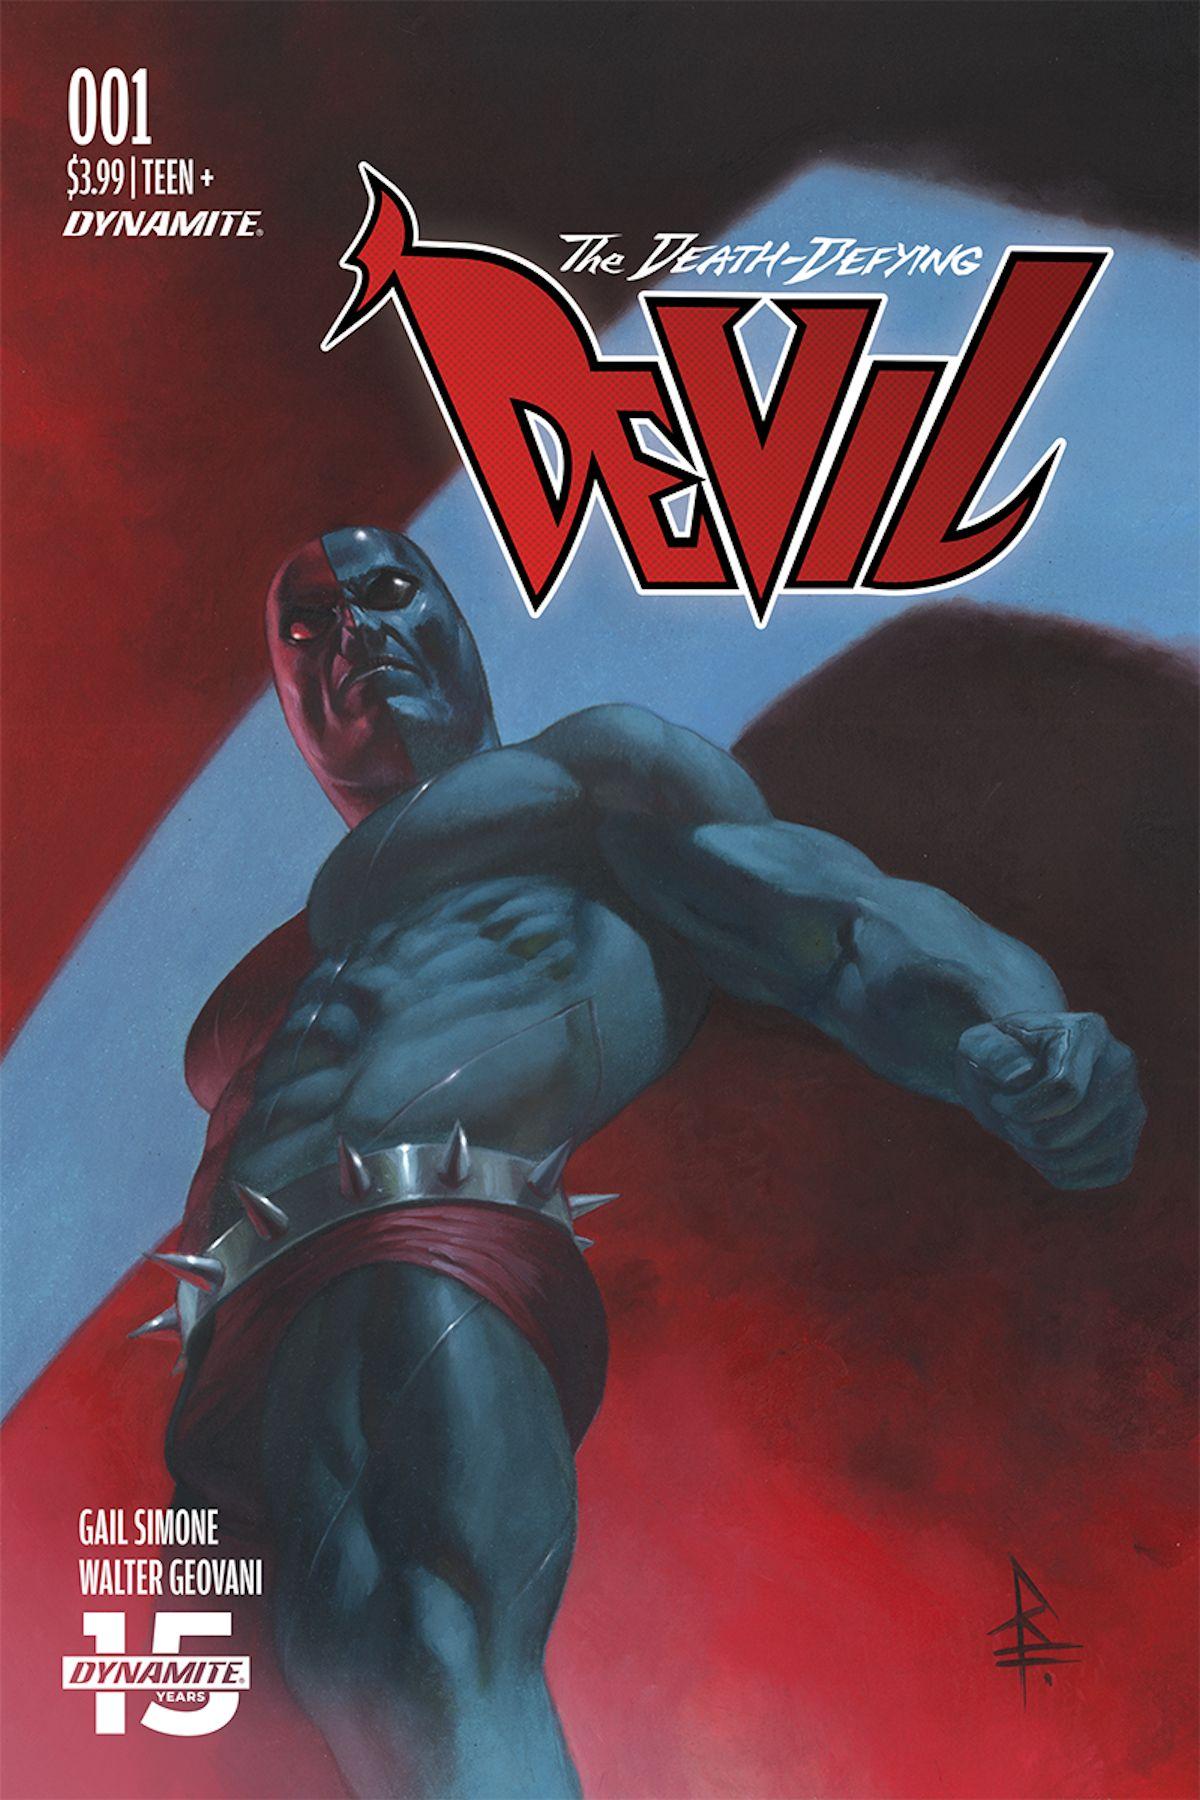 Death-Defying Devil